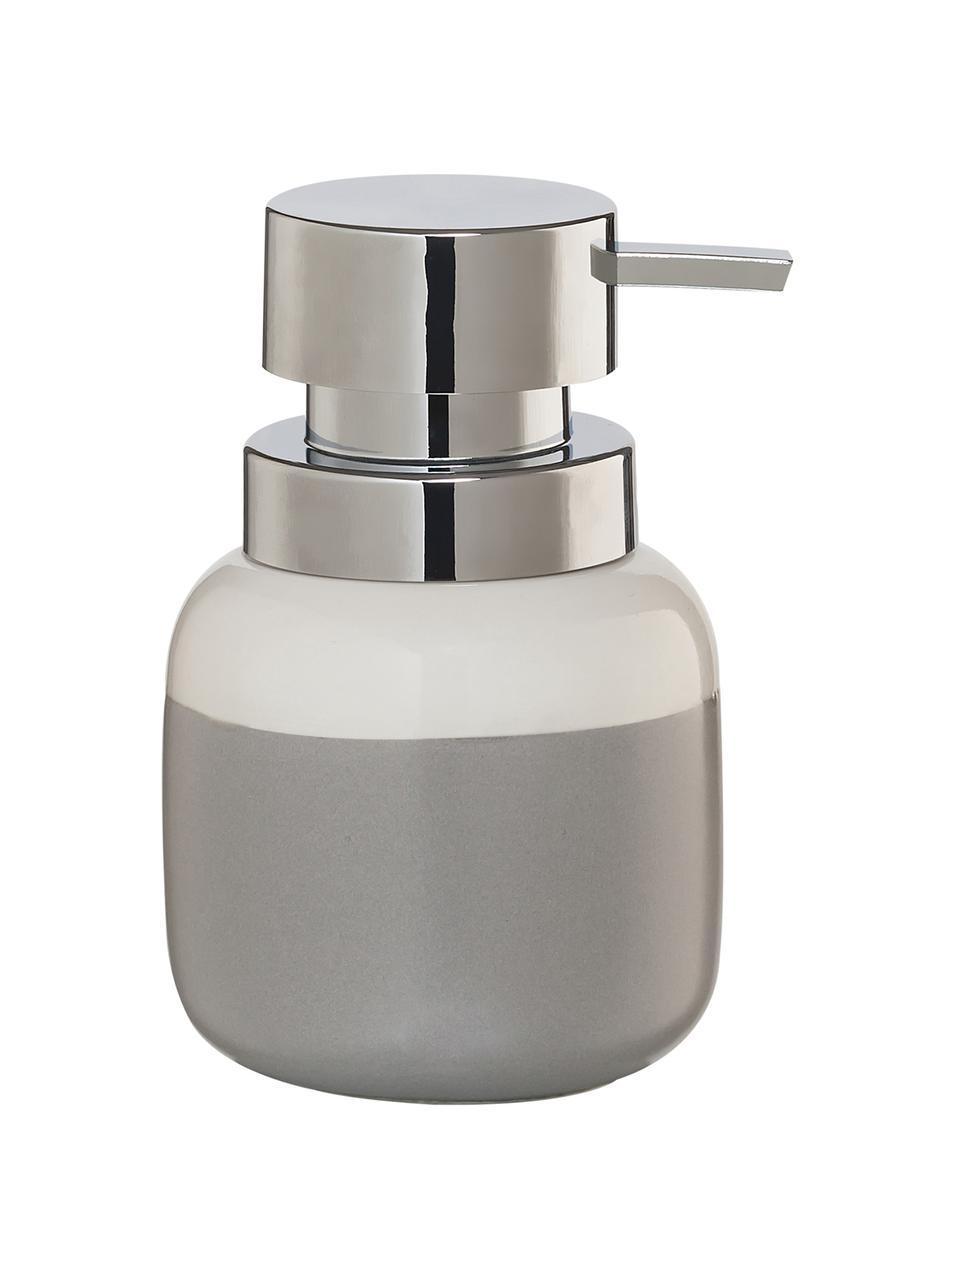 Porzellan-Seifenspender Sphere, Gefäß: Porzellan, Pumpkopf: Kunststoff, Gefäß: Hellgrau, WeißPumpkopf: Silberfarben, Ø 10 x H 14 cm